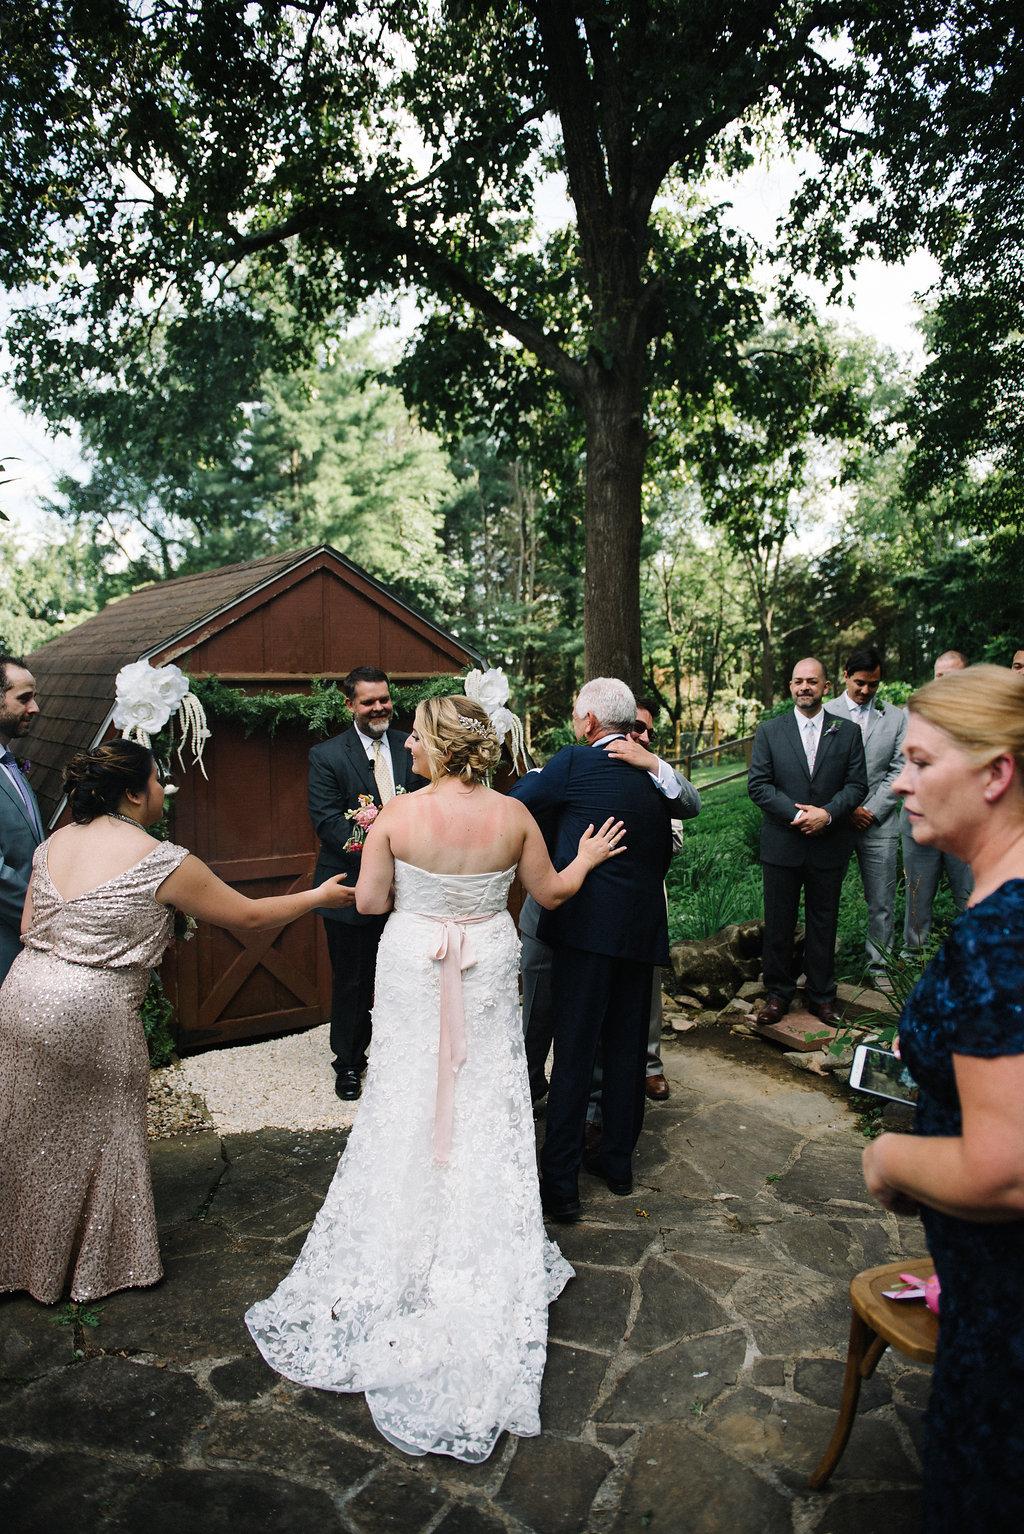 giving-the-bride-away.jpg